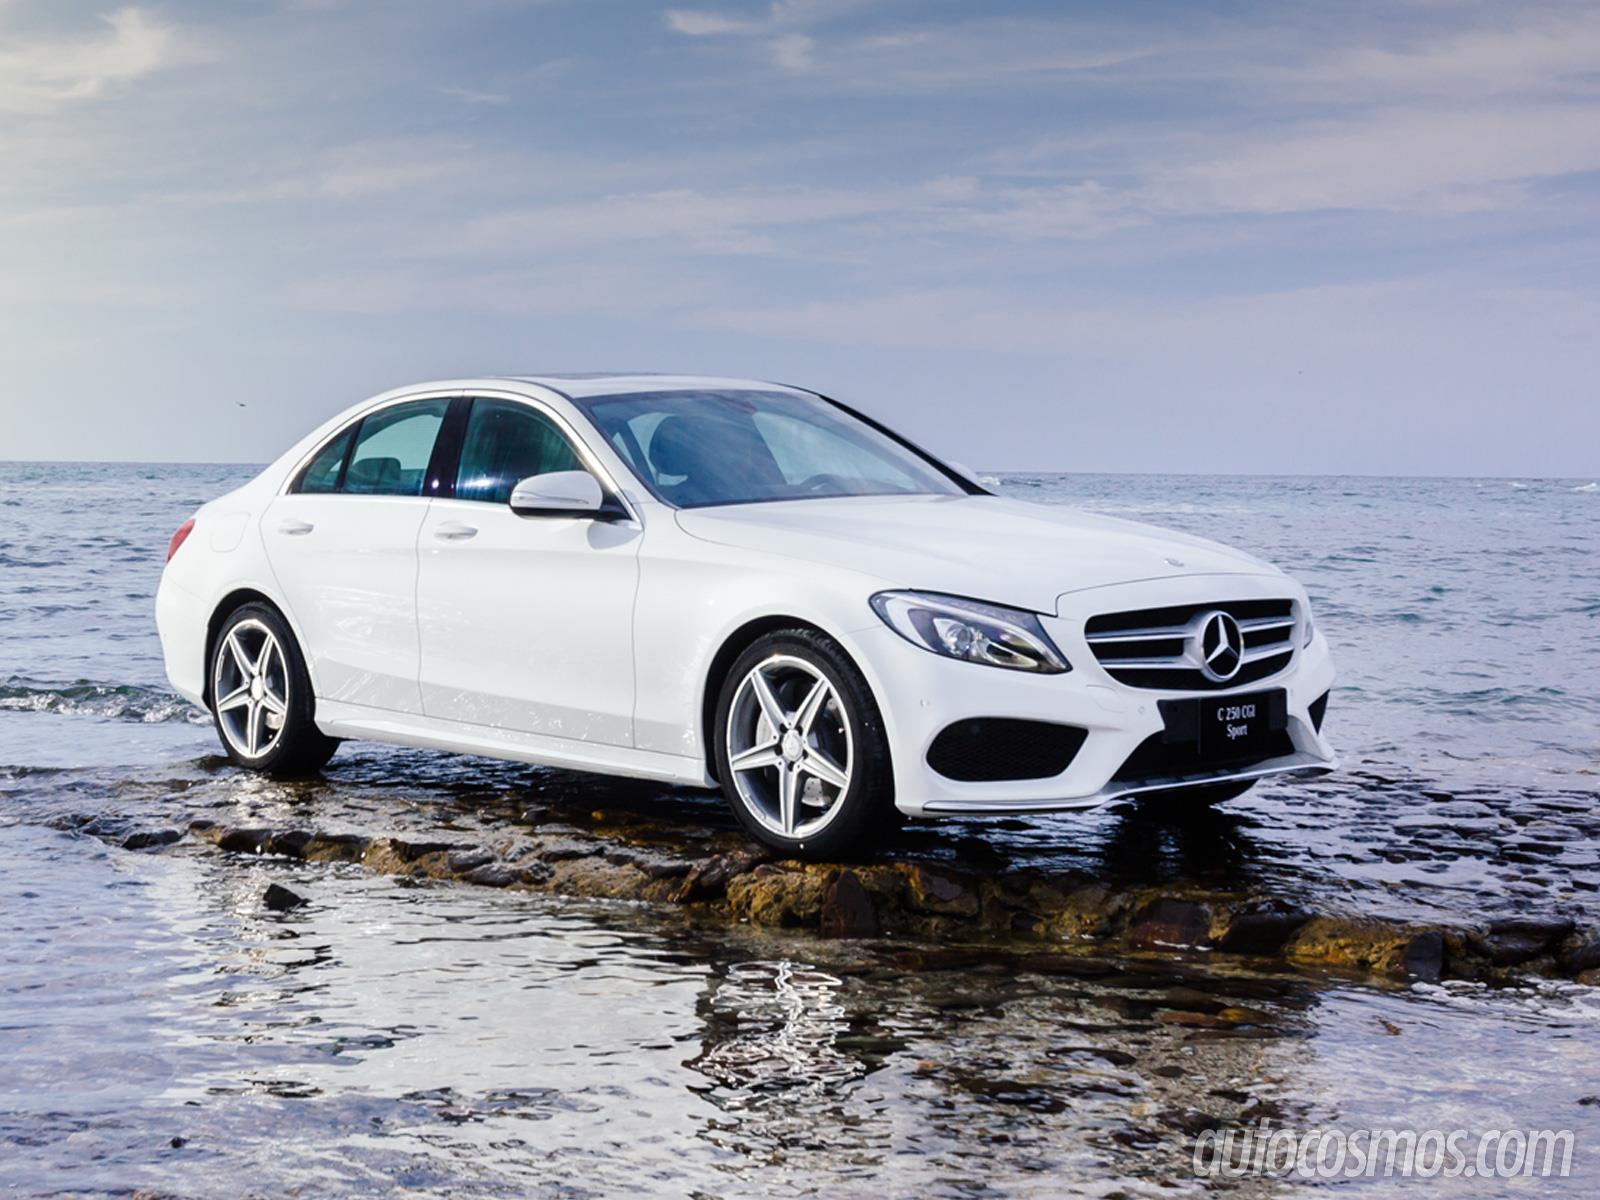 Manejamos el mercedes benz clase c 2015 for Mercedes benz clase c